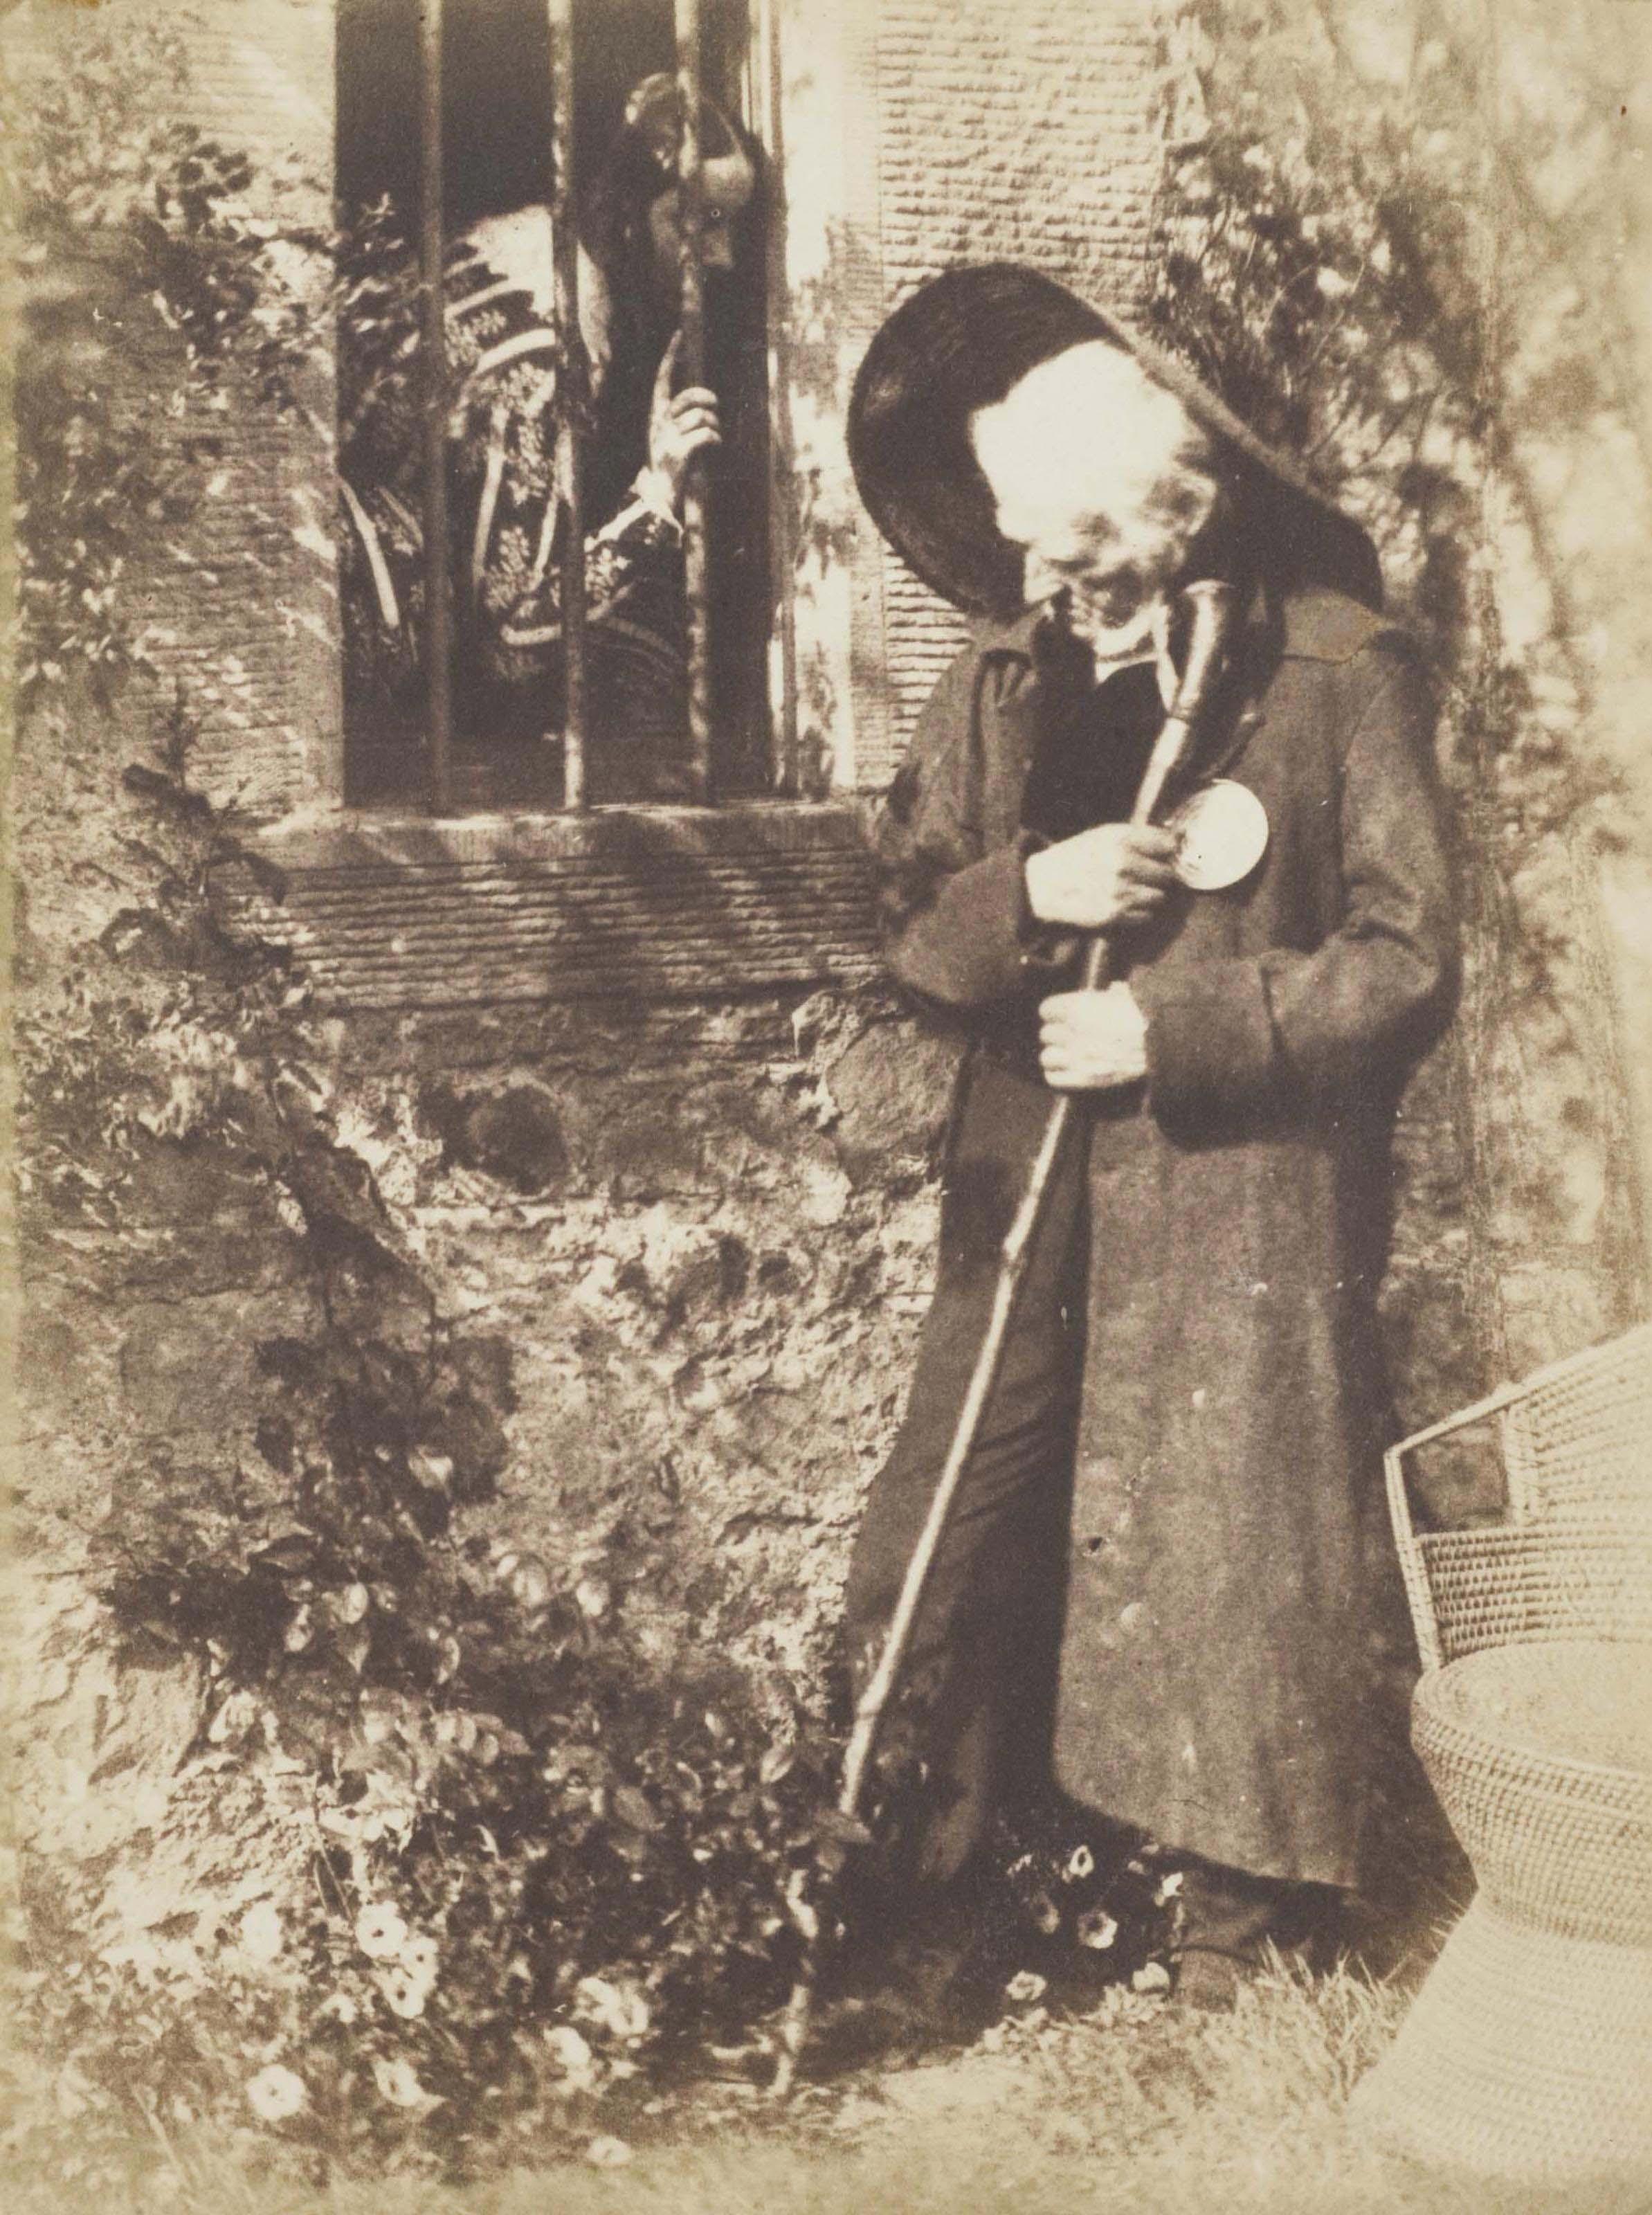 Study in Bonaly: Eddie Ochiltree, circa 1845